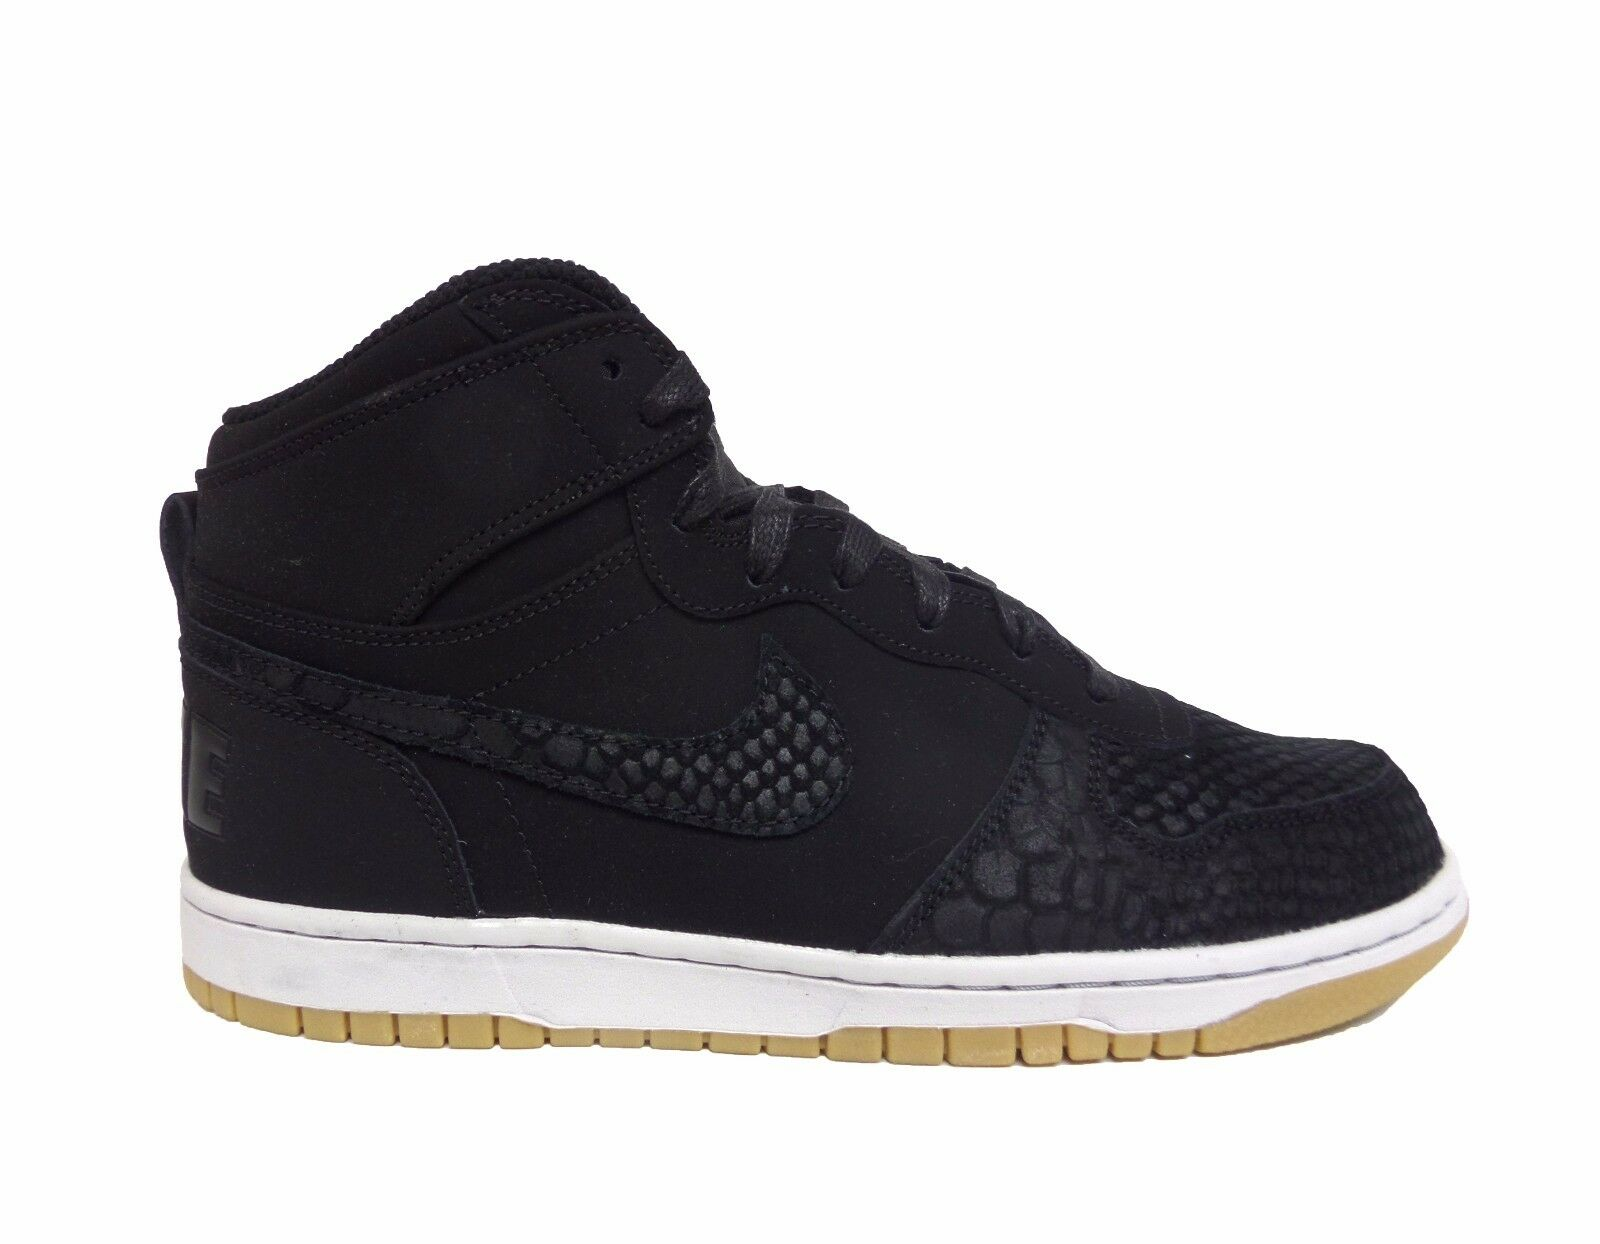 Nike Men's BIG NIKE HIGH LUX Shoes Black/Black/Platinum/Gum 854165-001 a